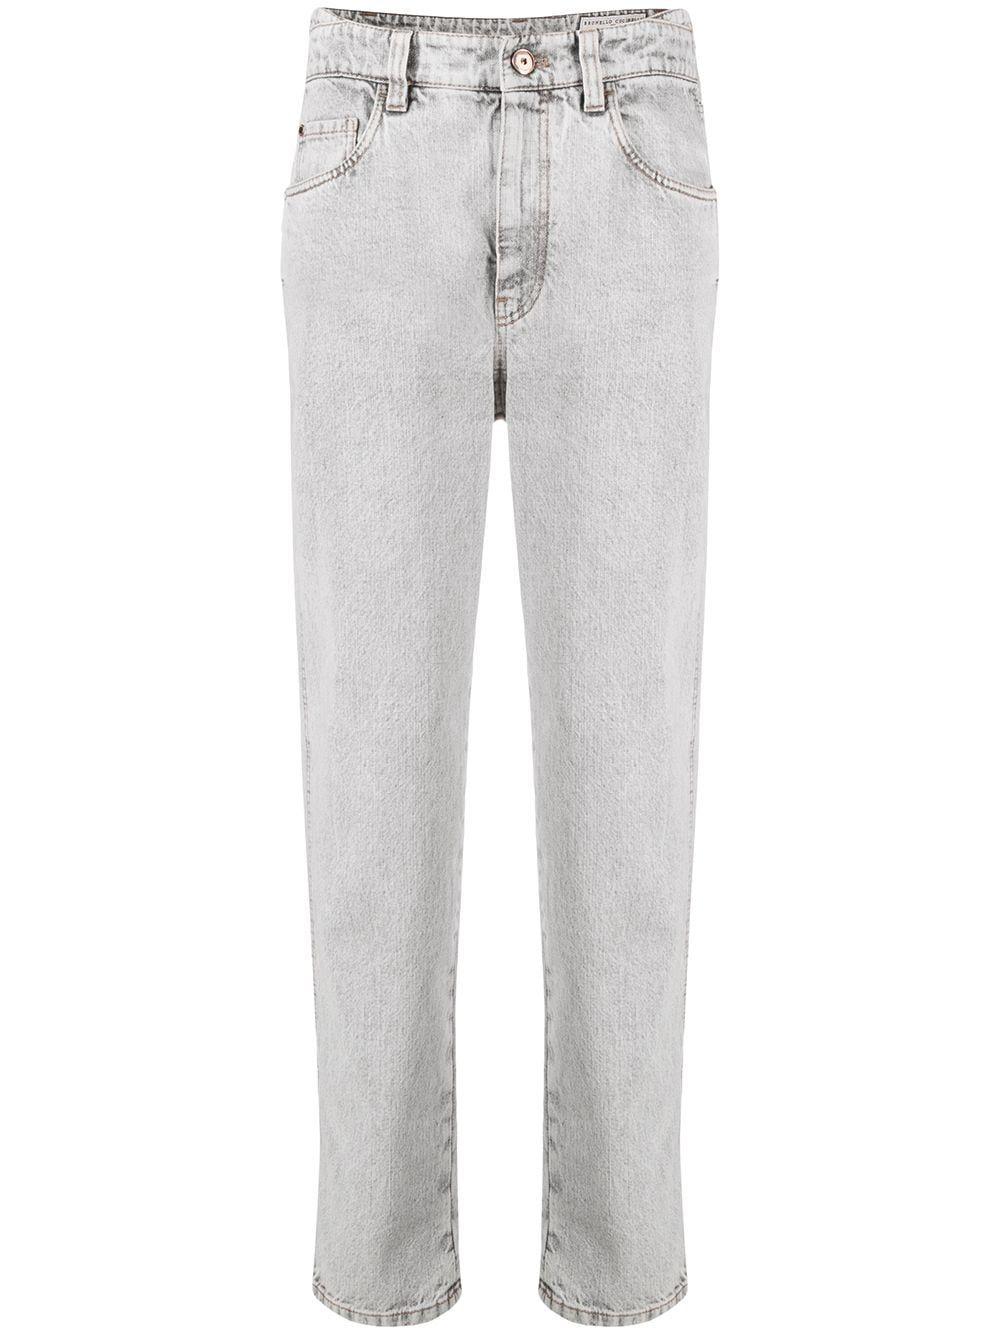 Brunello Cucinelli Straight jeans BRUNELLO CUCINELLI WOMEN'S GREY COTTON JEANS